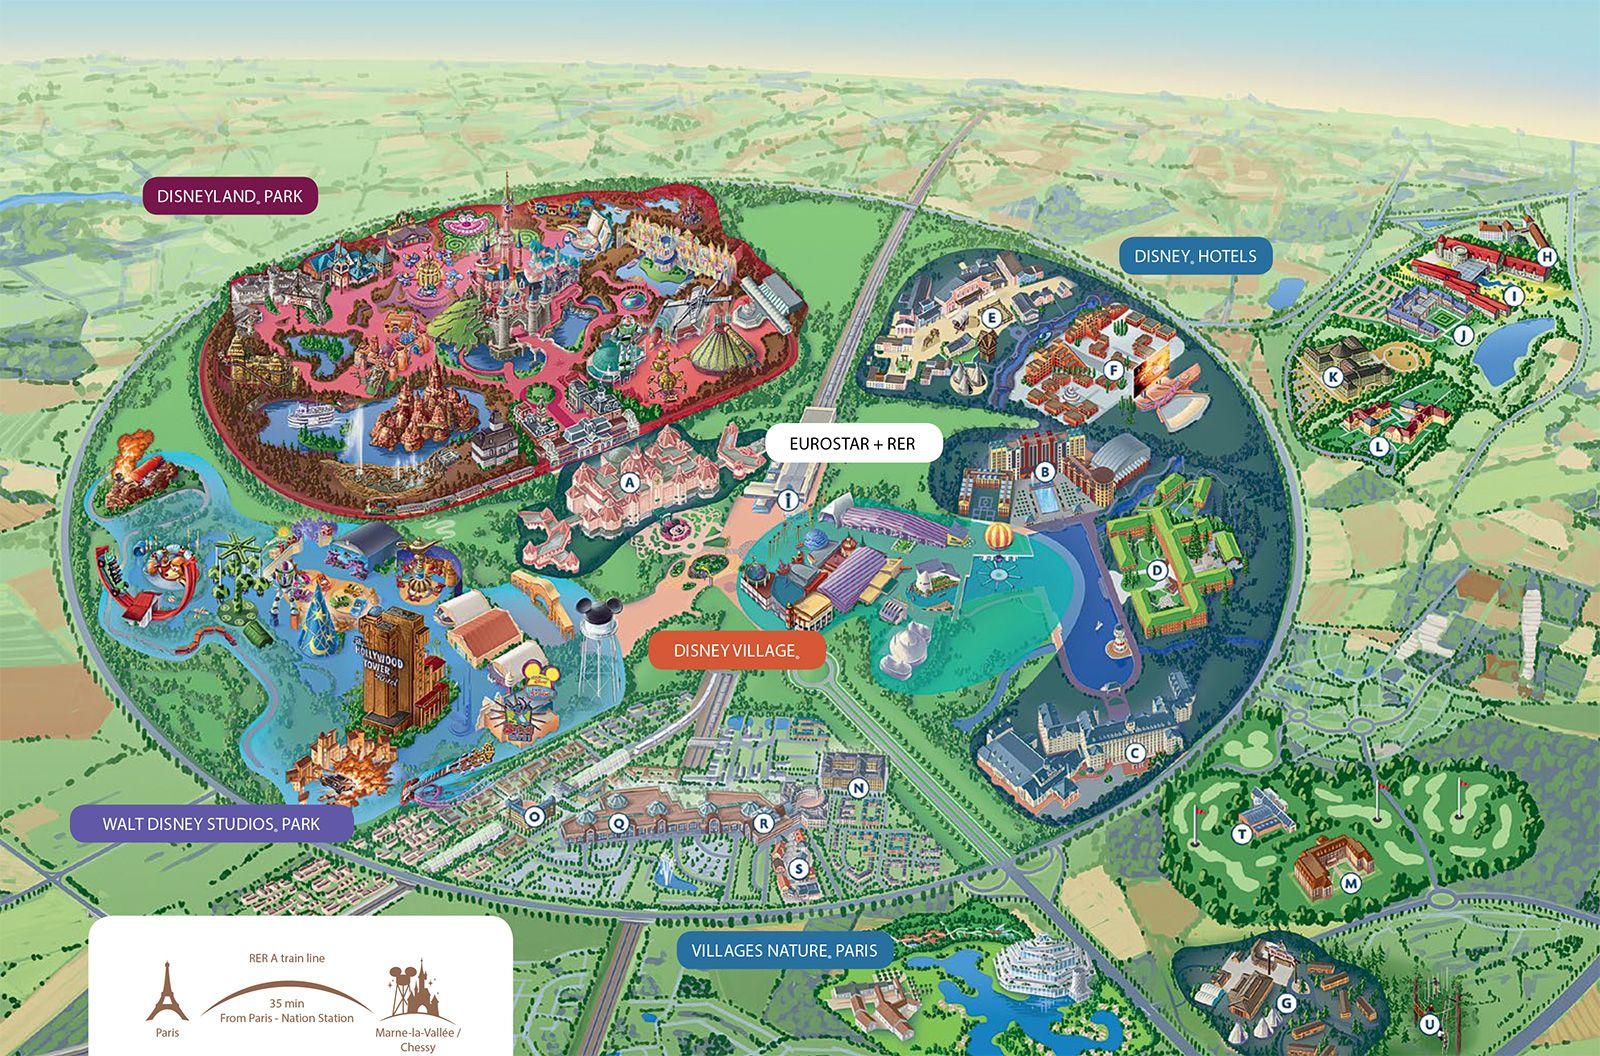 Disneyland Paris Map Disneyland paris, Disney map